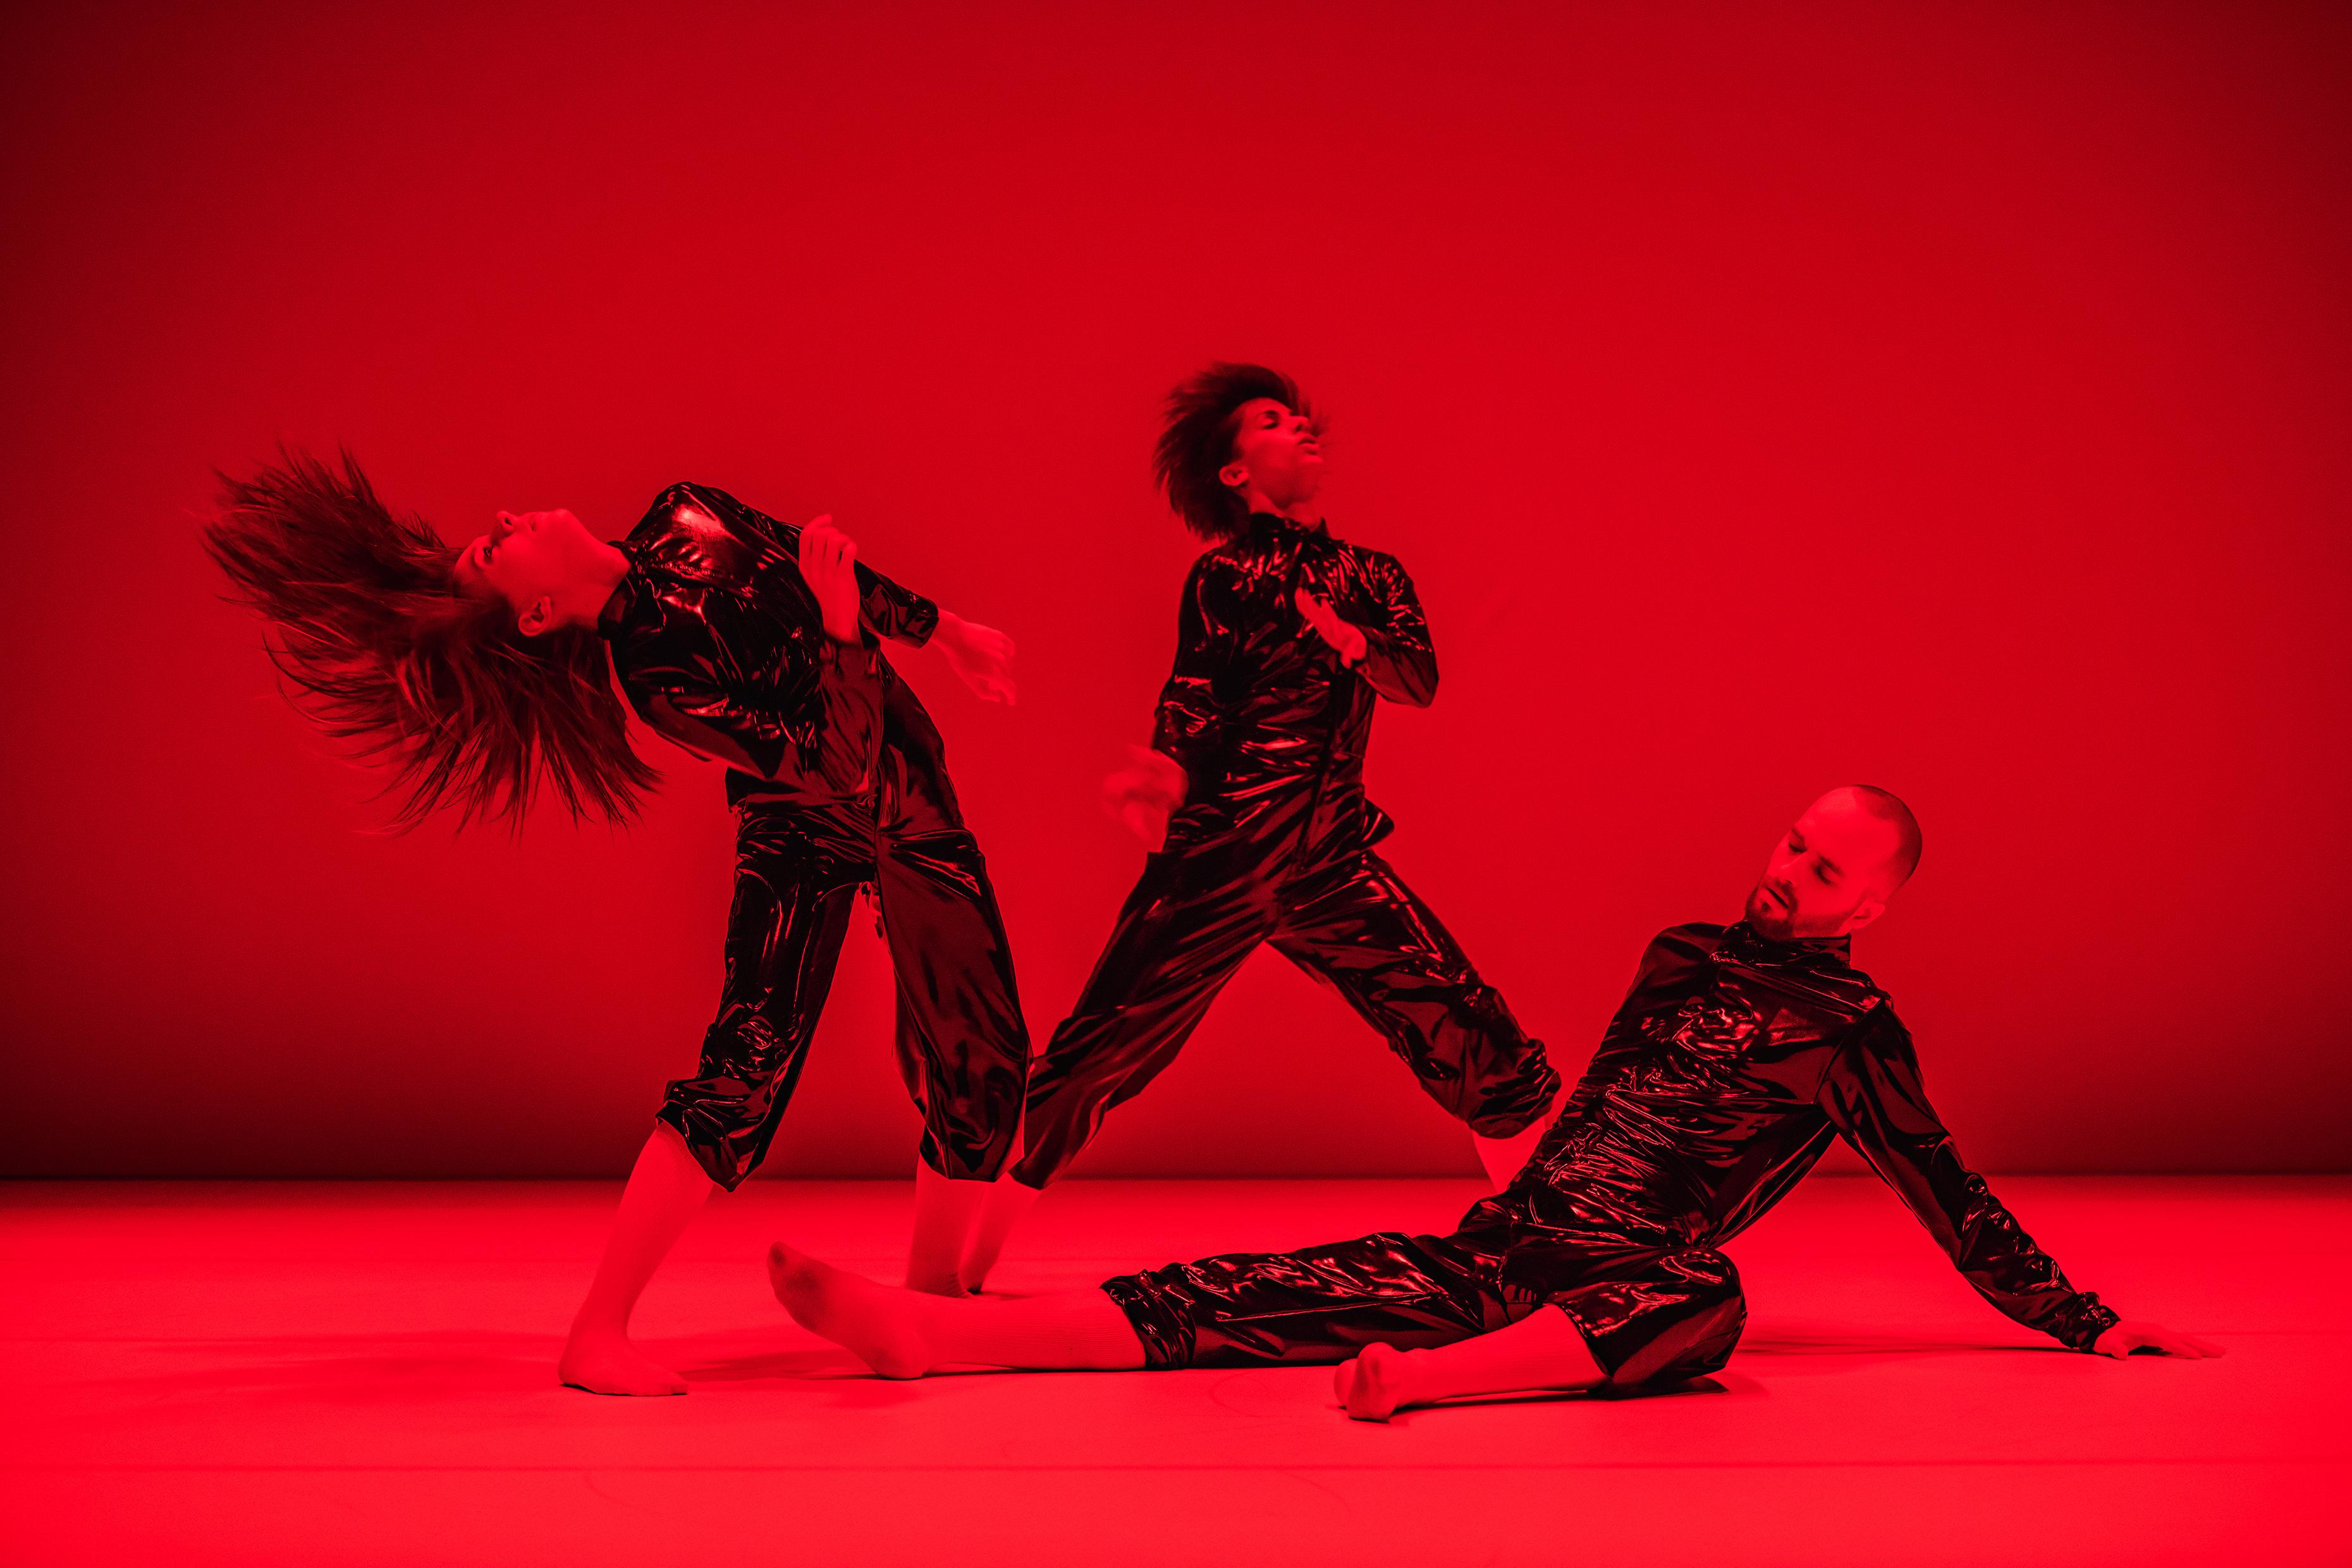 Svart Invärtes - dance